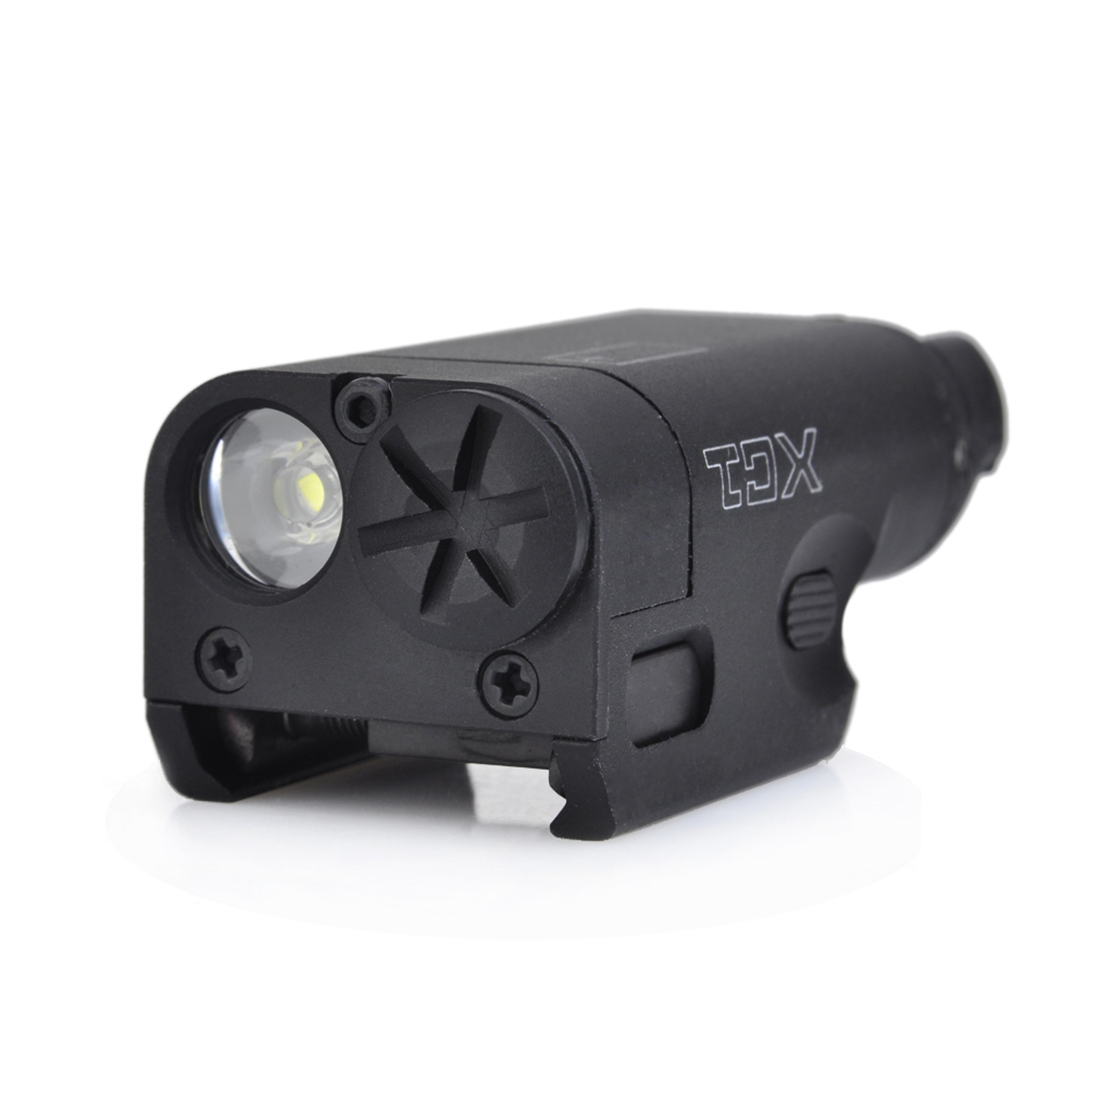 Surwish Tactical XC1 Pistol Flashlight Weapon Light Flashlight Glock SF XC1 Ultra Compact Hand Light for Nerf Games